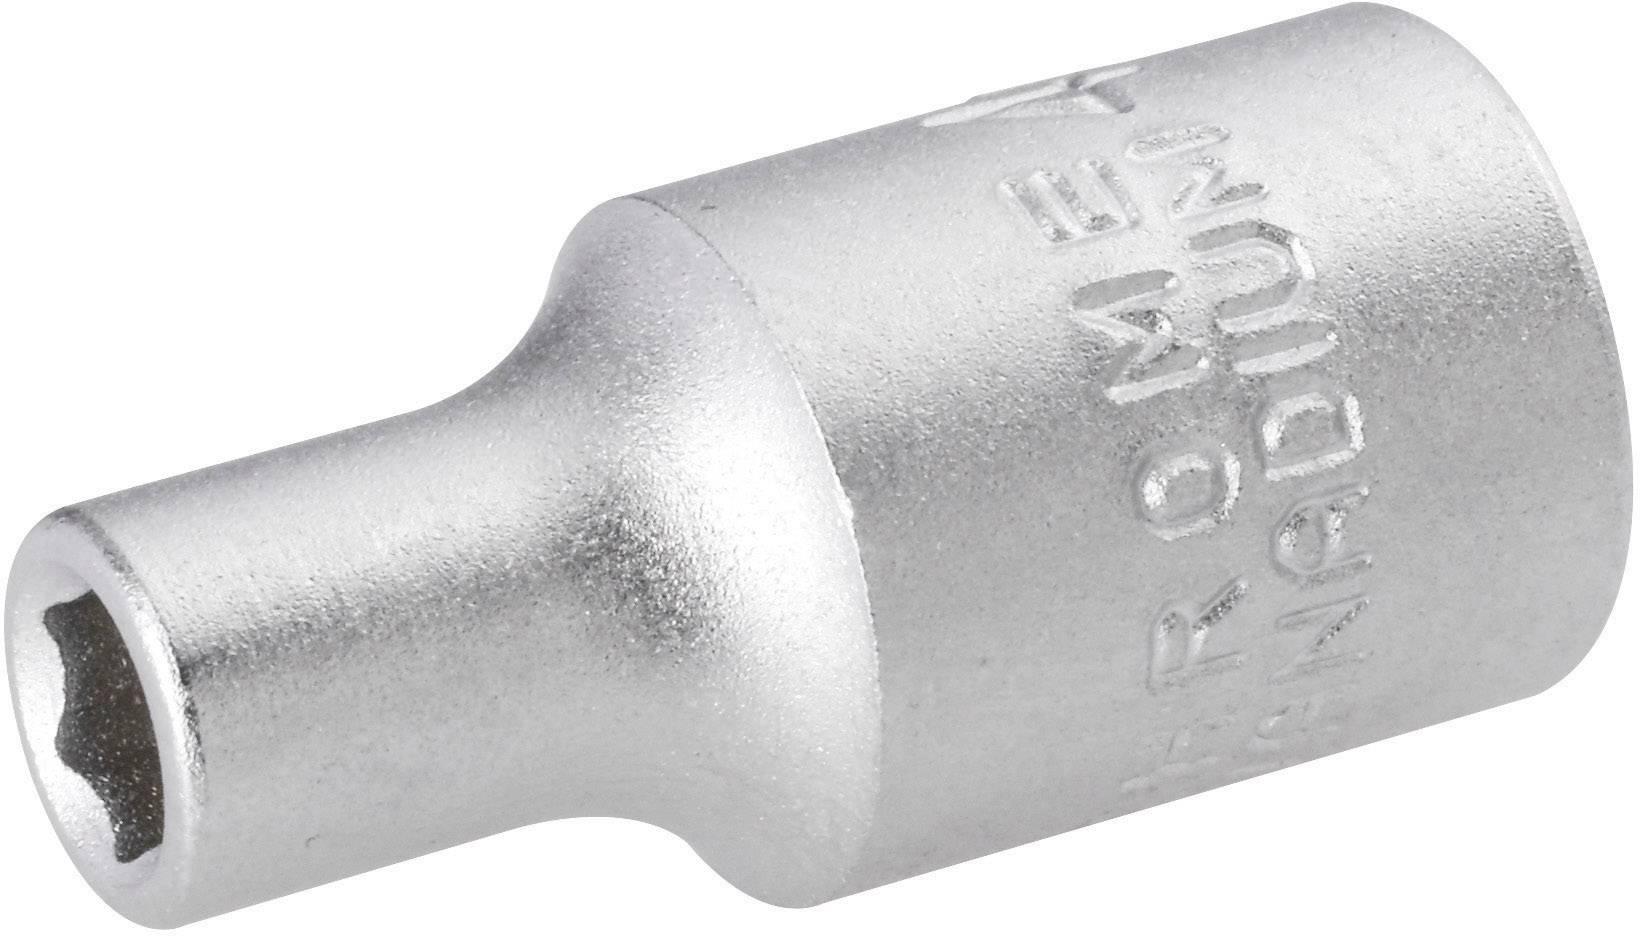 "Nástavec na račňu TOOLCRAFT 820749, vonkajší šesťhran, 1/4"" (6,3 mm), 10 mm, chróm-vanadiová oceľ"